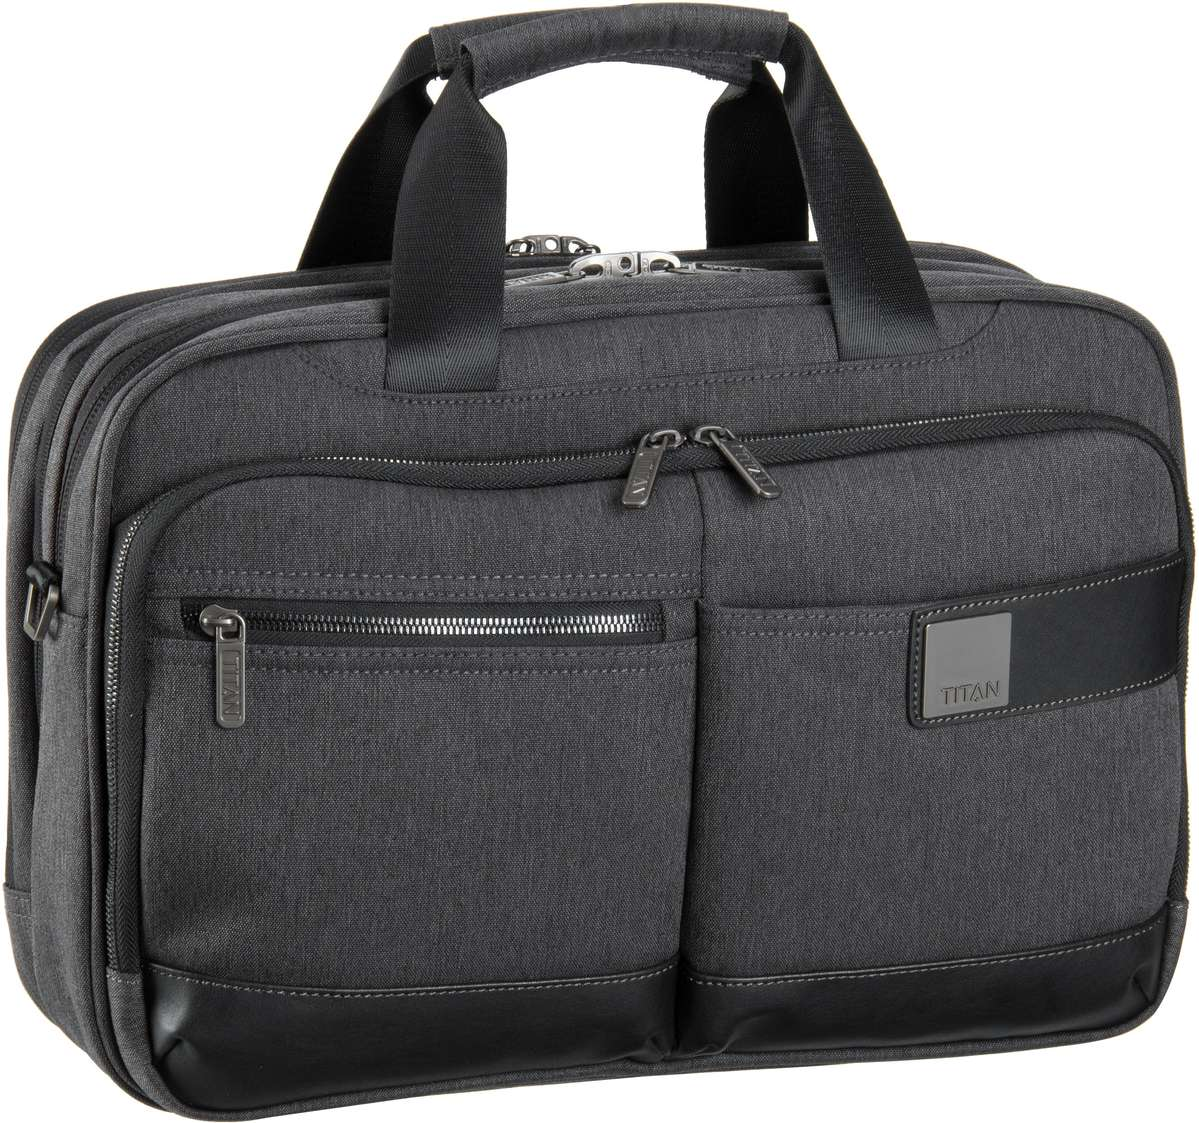 Power Pack Laptop Bag S Mixed Grey